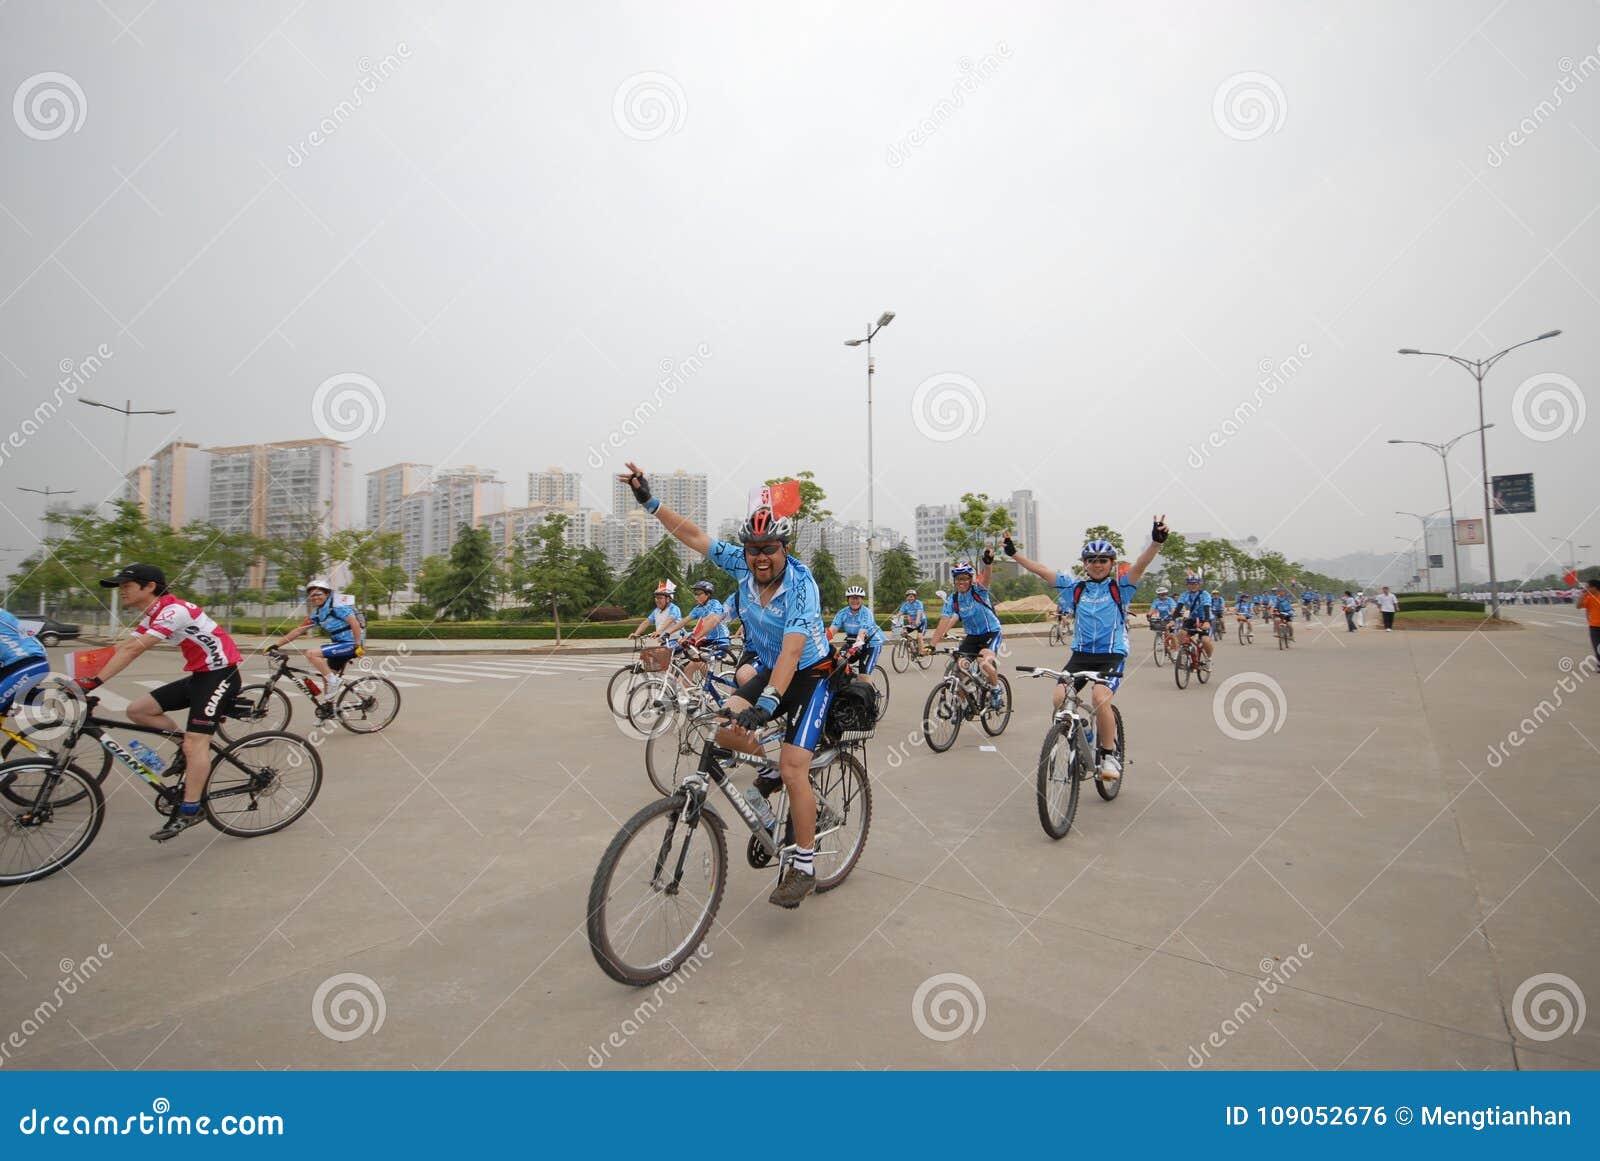 Bicycle Racing Driver-extensive Mass Fitness Programs